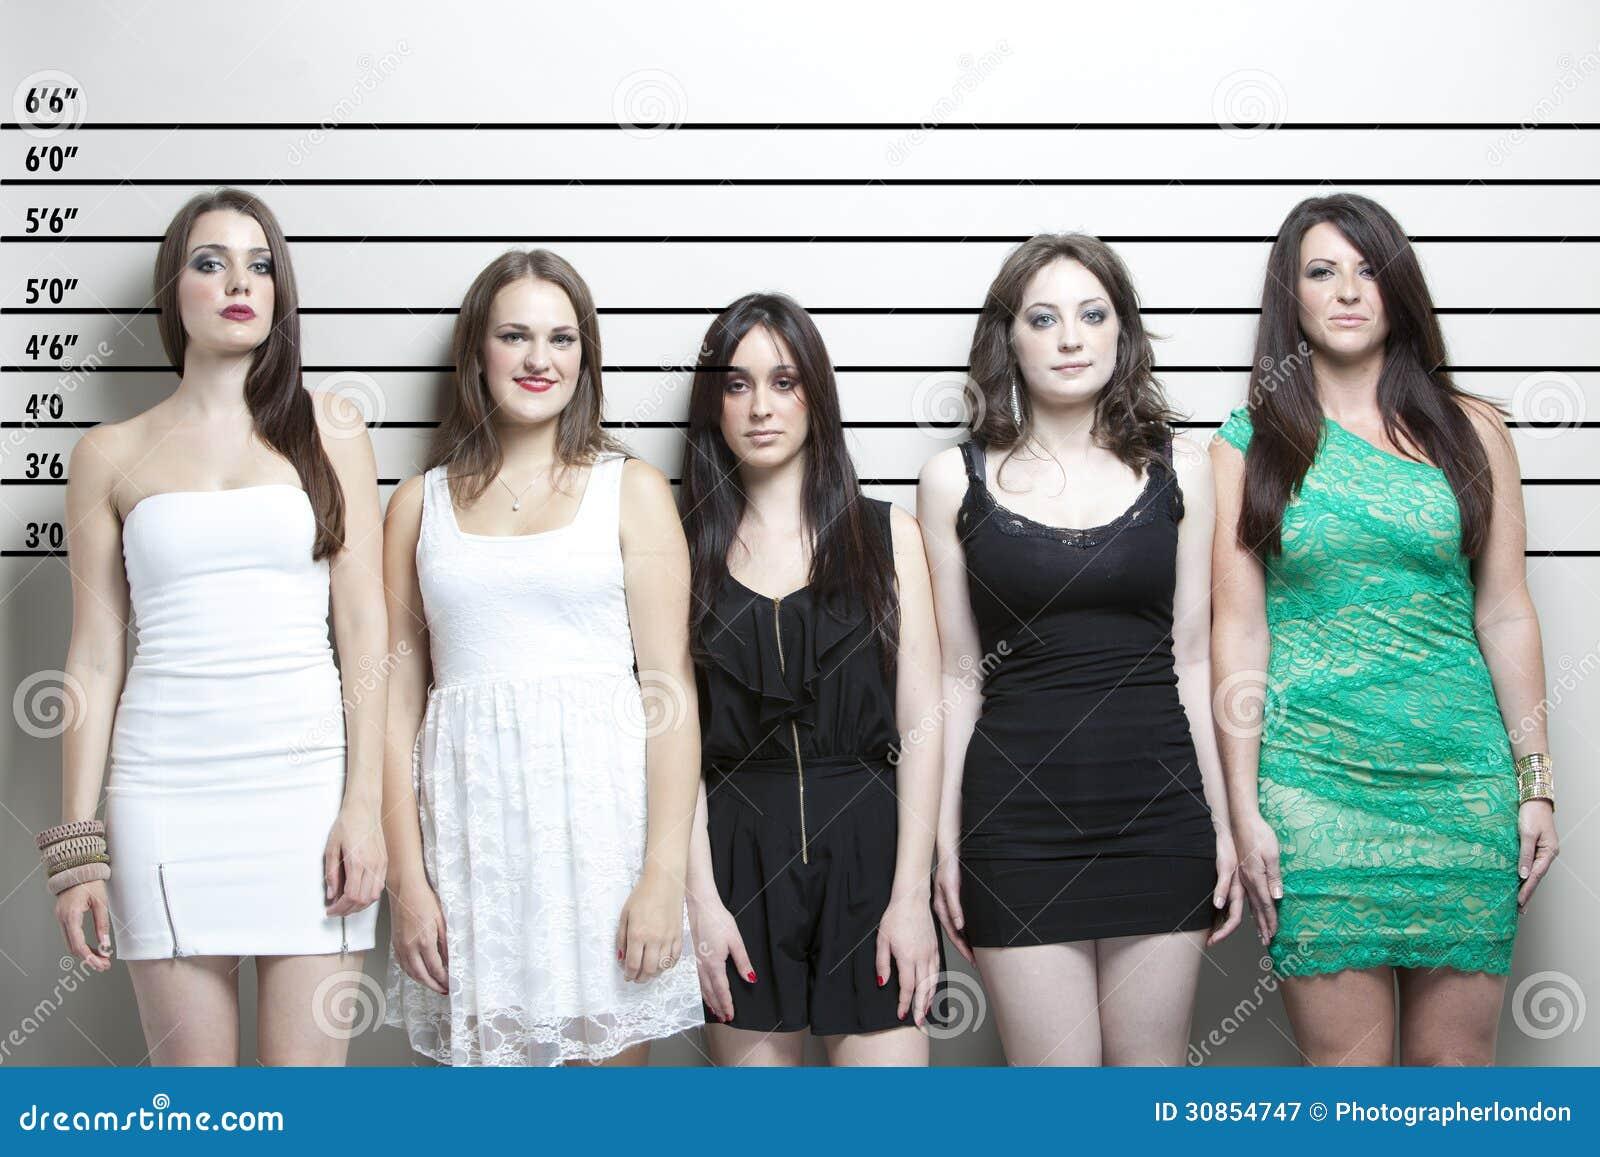 Women lineup online picture 97